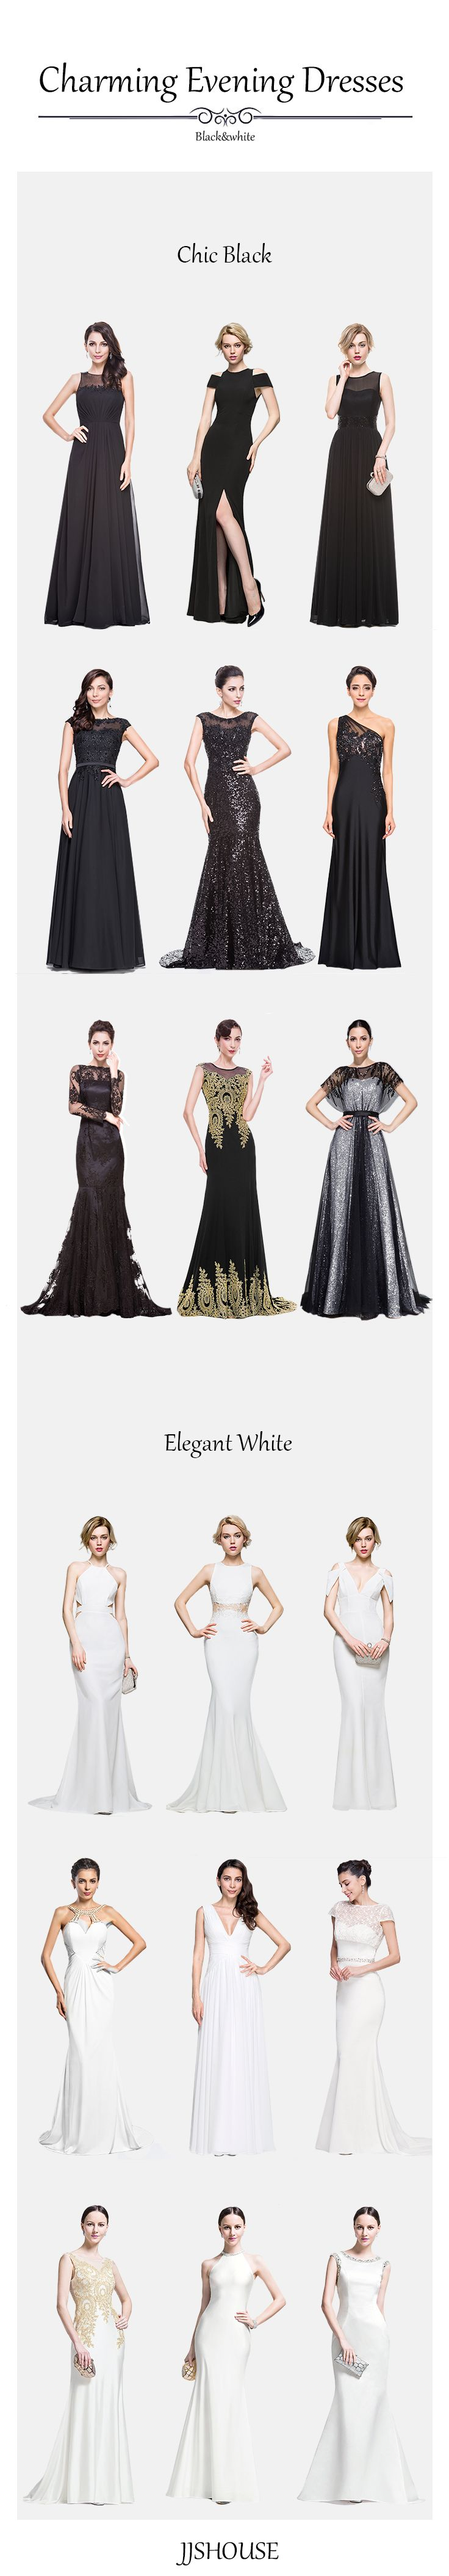 Chic Black & Elegant White #Eveningdresses! Choose one now! JJSHOUSE